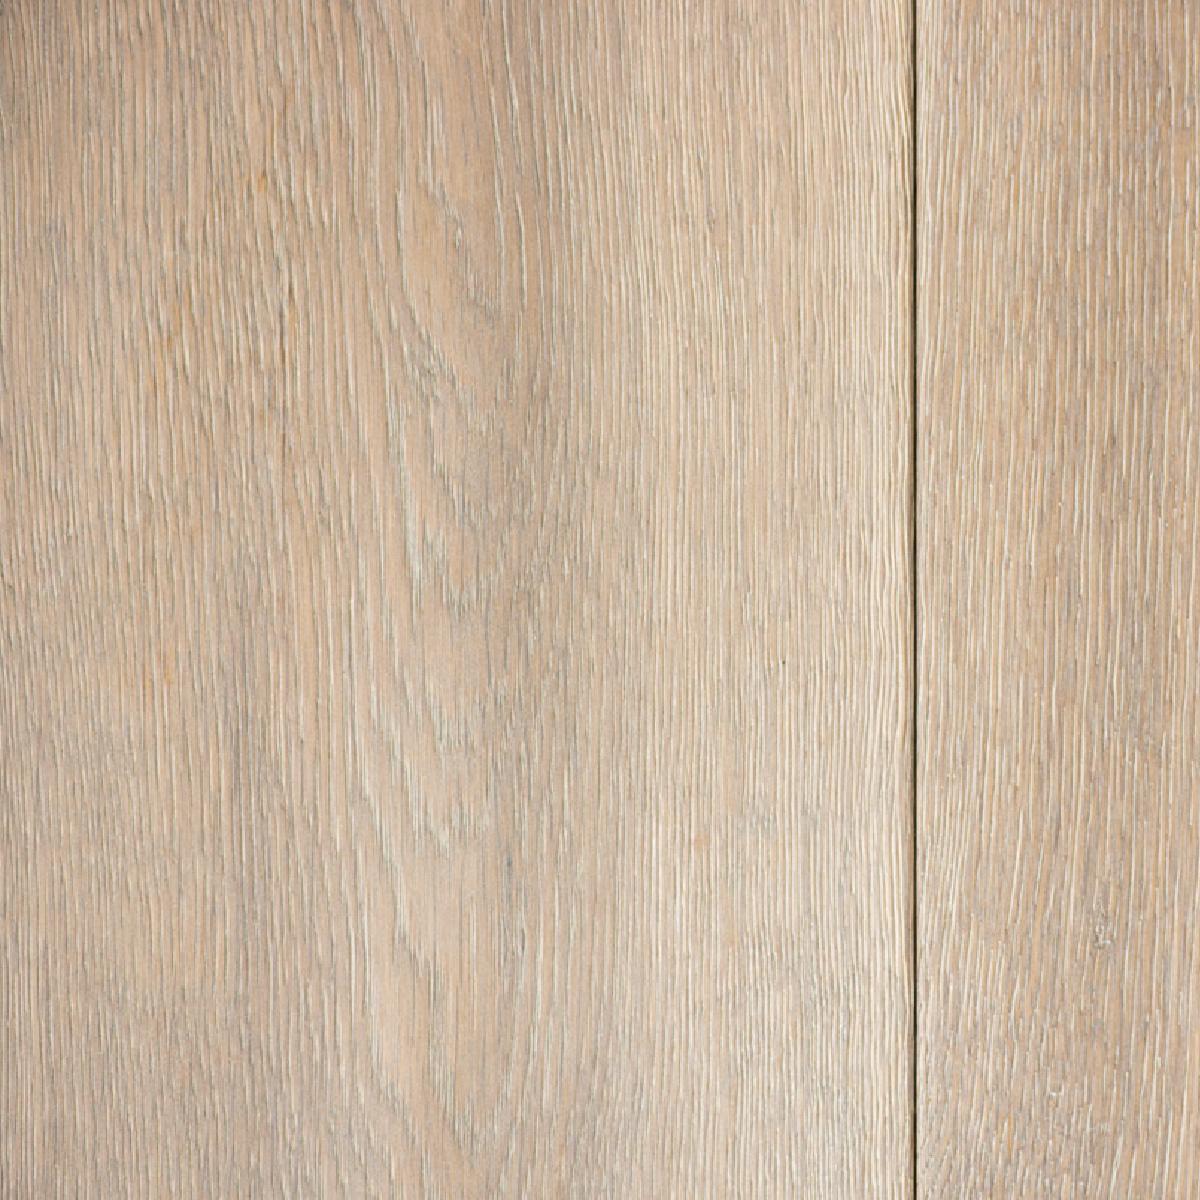 SQlight-fine-wood-01.png